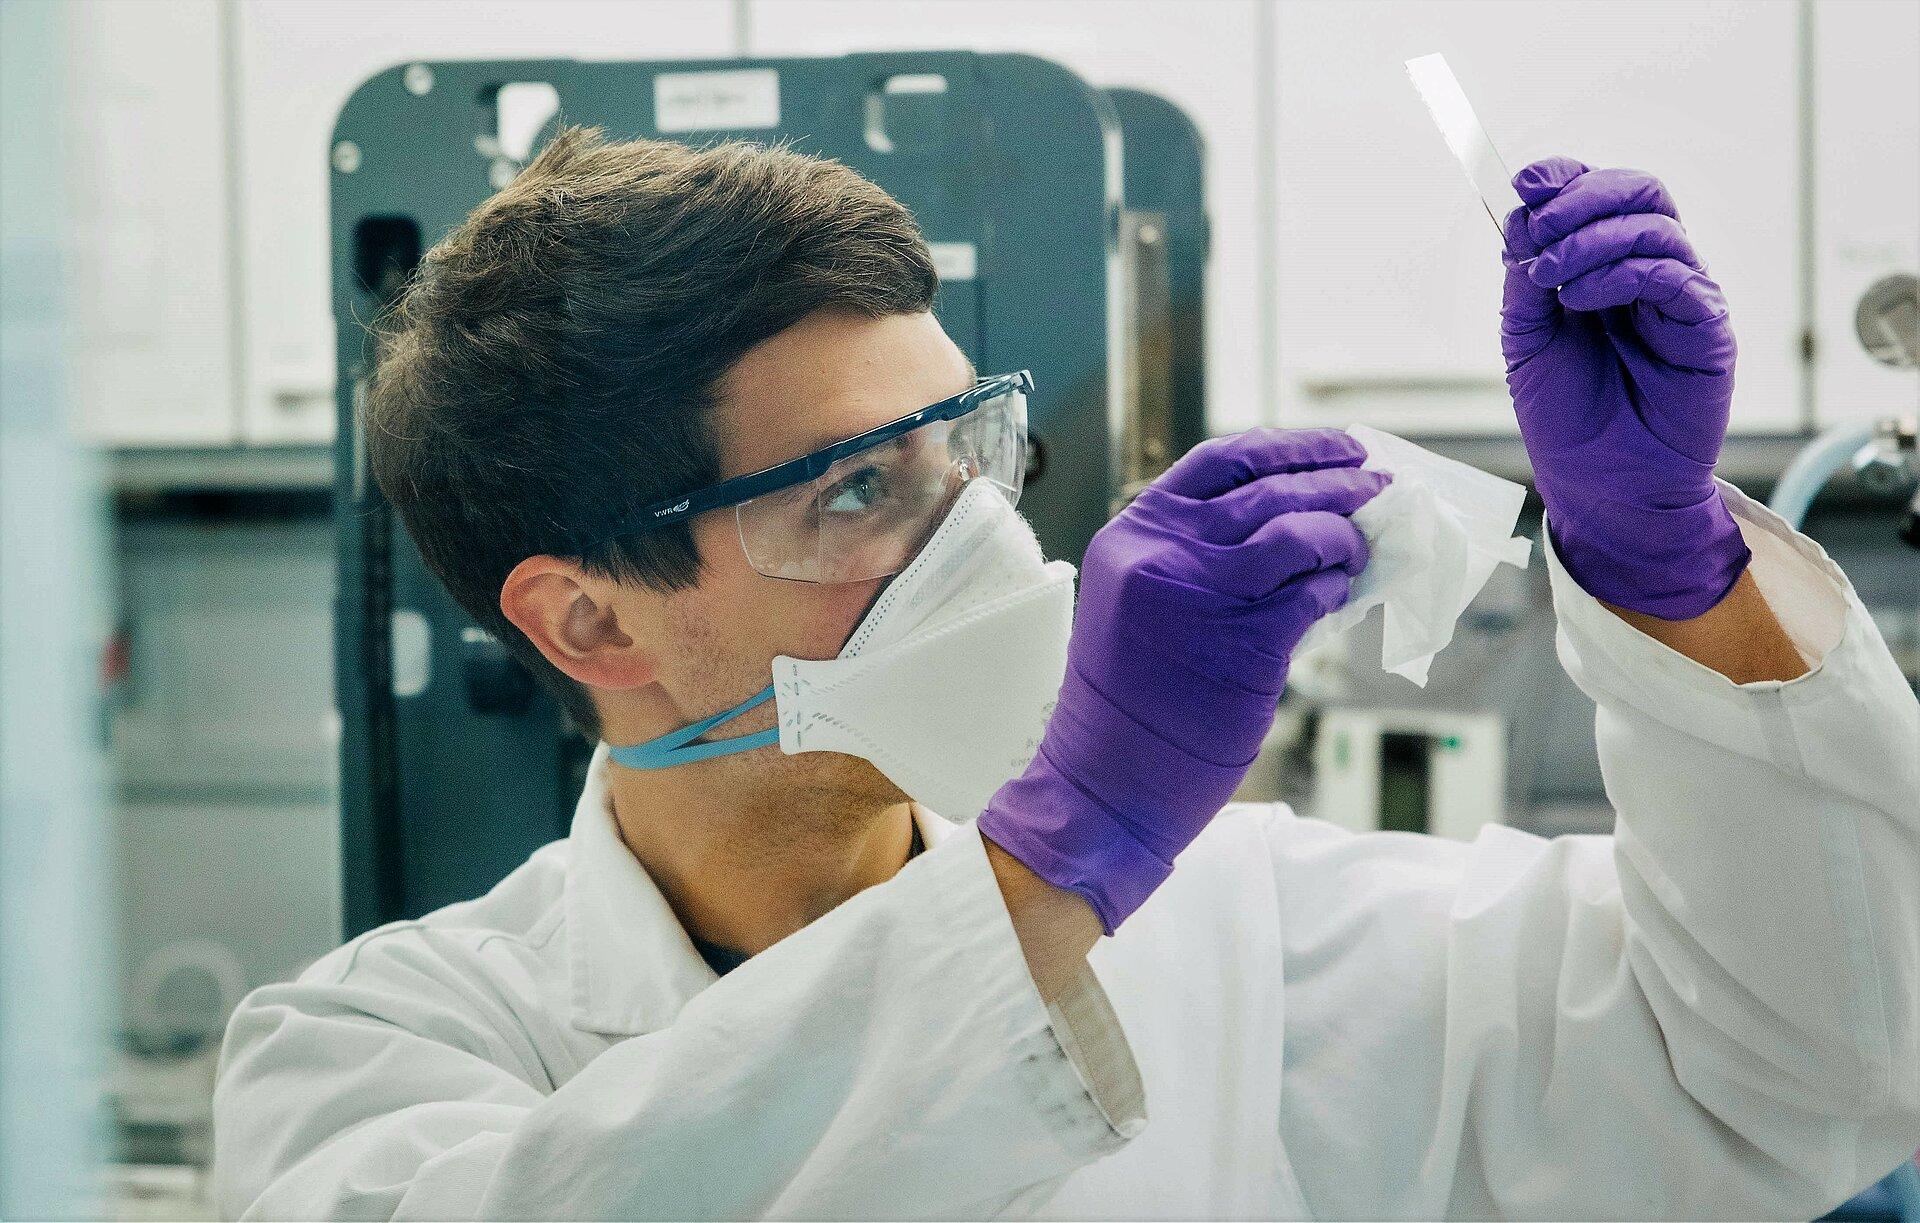 Forscher im Trockenraum